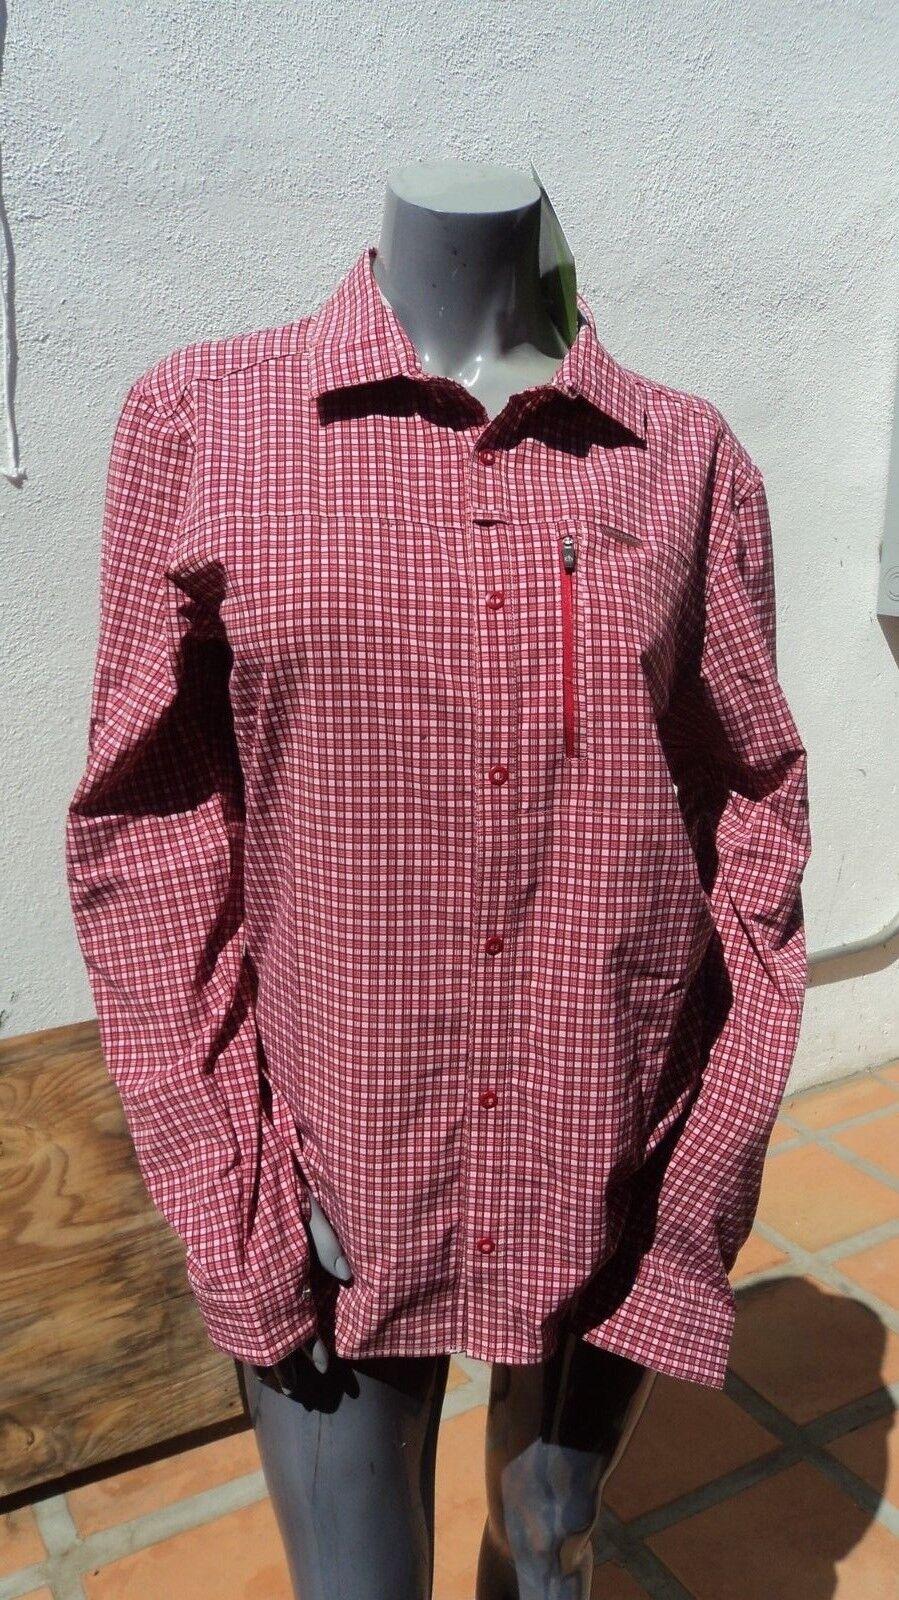 Craighoppers CMS491 Red NL Berko Long Sleeved Shirt